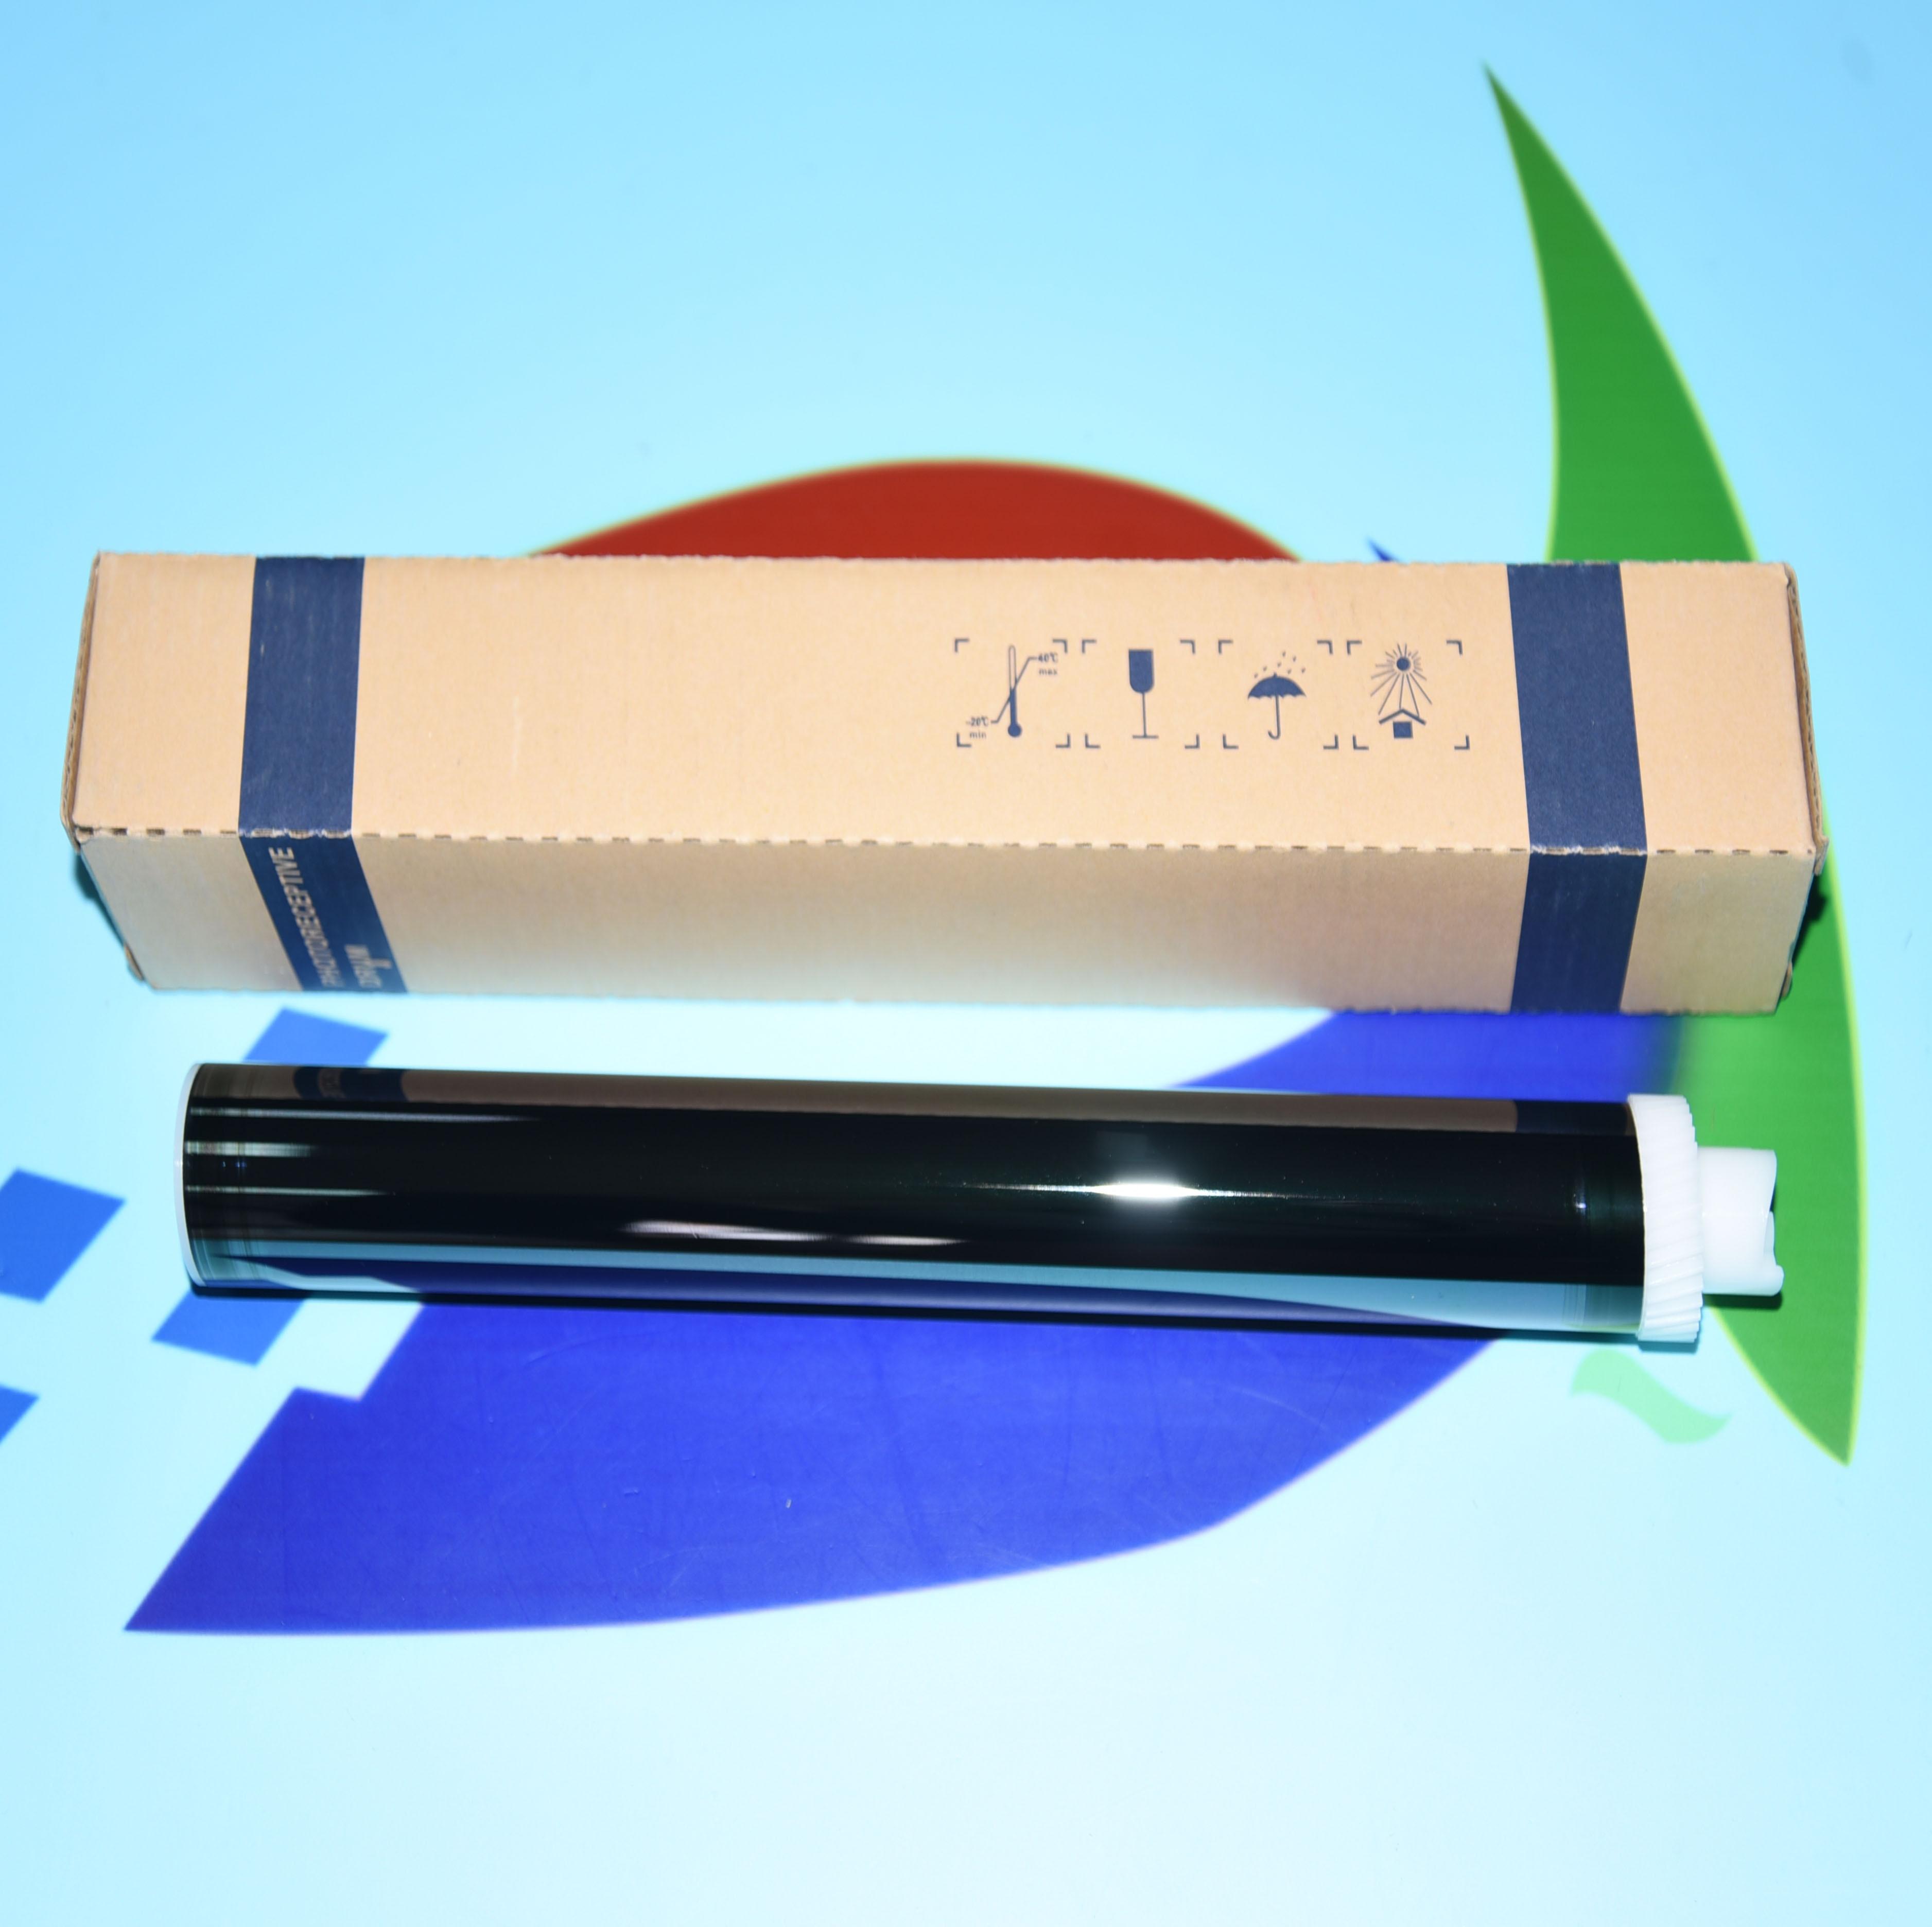 1 шт. фотобарабан для Kyocera FS2100 FS4100 FS4200 M3040 FS4300 3540 3550 3560